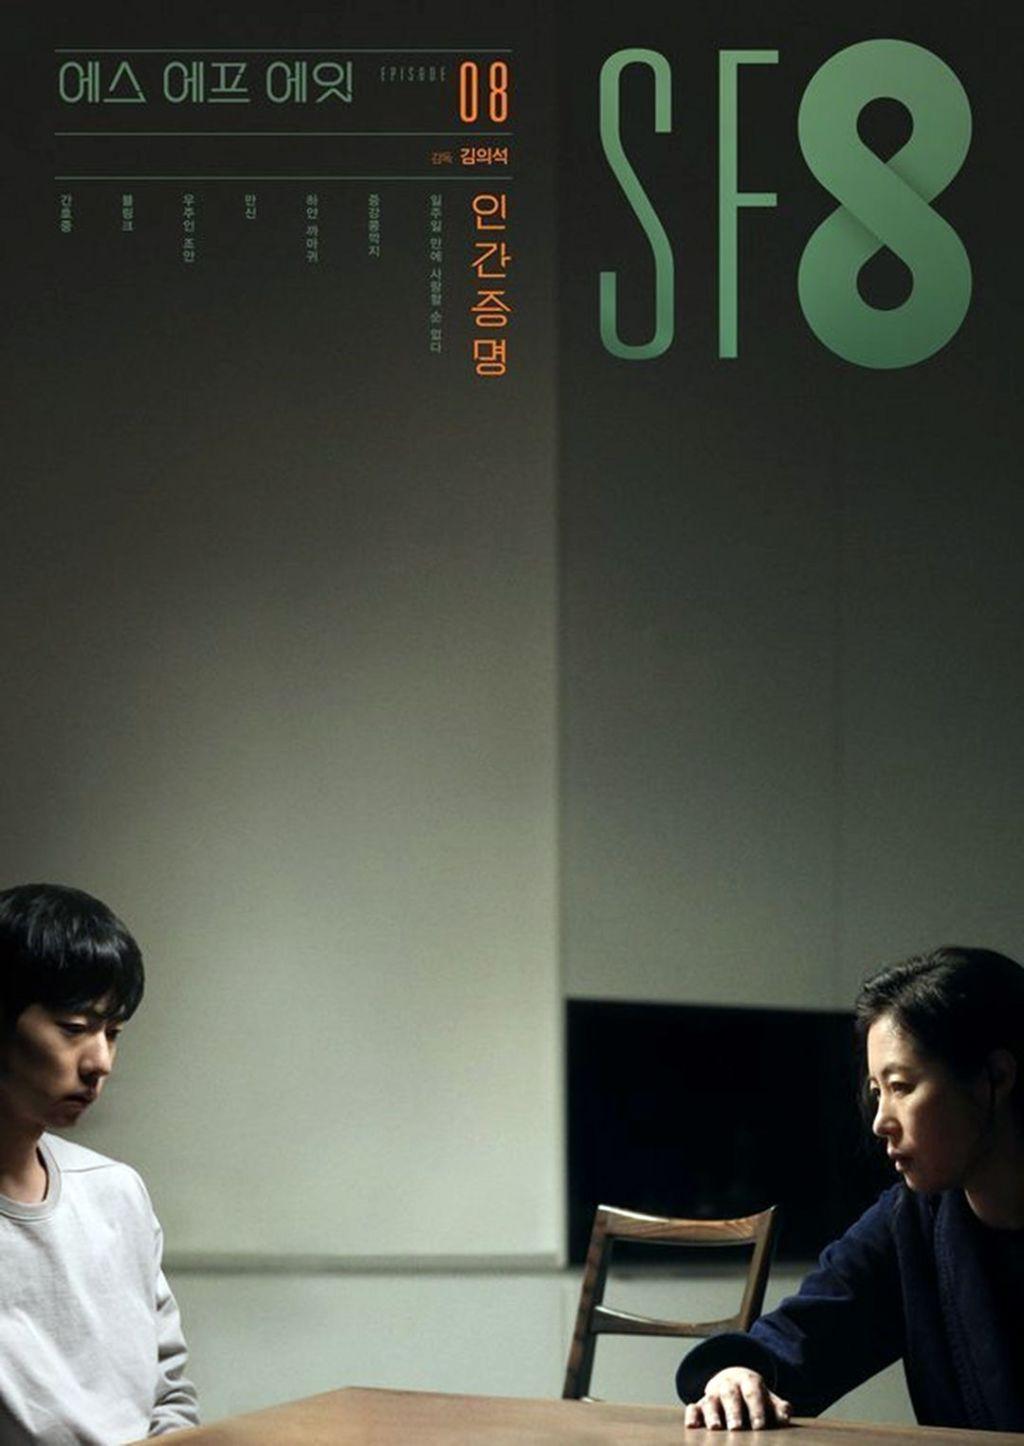 Sinopsis Dan Profil Lengkap Pemeran K-Drama SF8: Empty Body (2020)